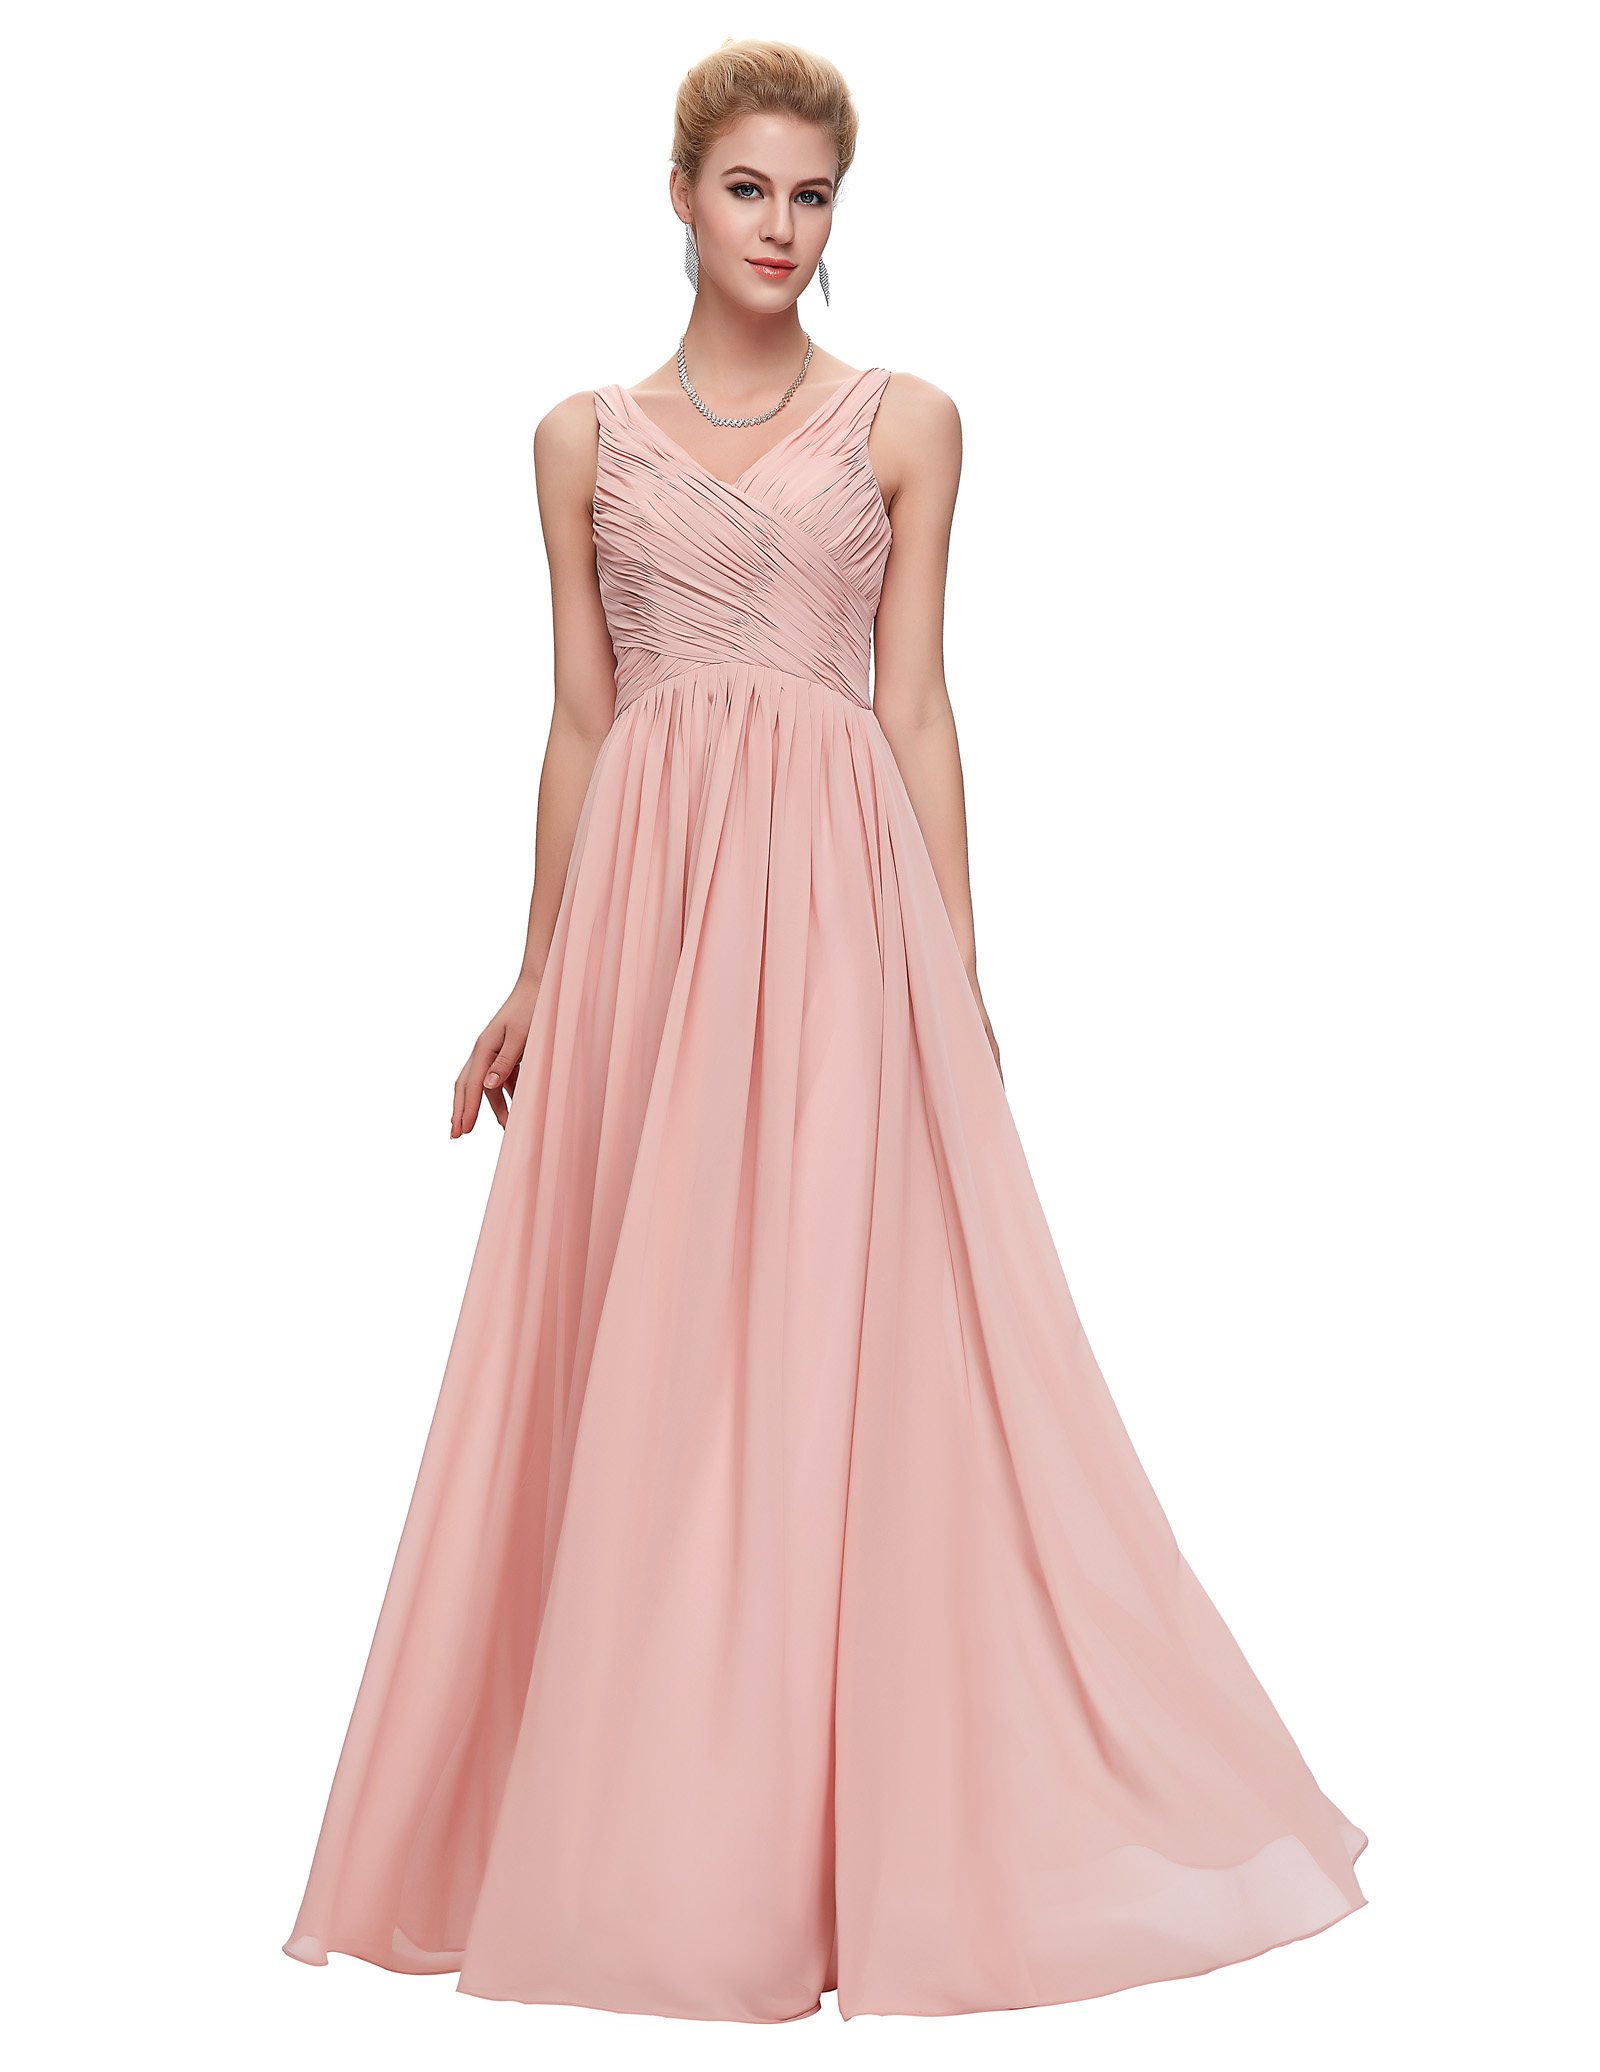 Grace karin aqua azul de dama de honor vestidos de blush rosa rojo ...